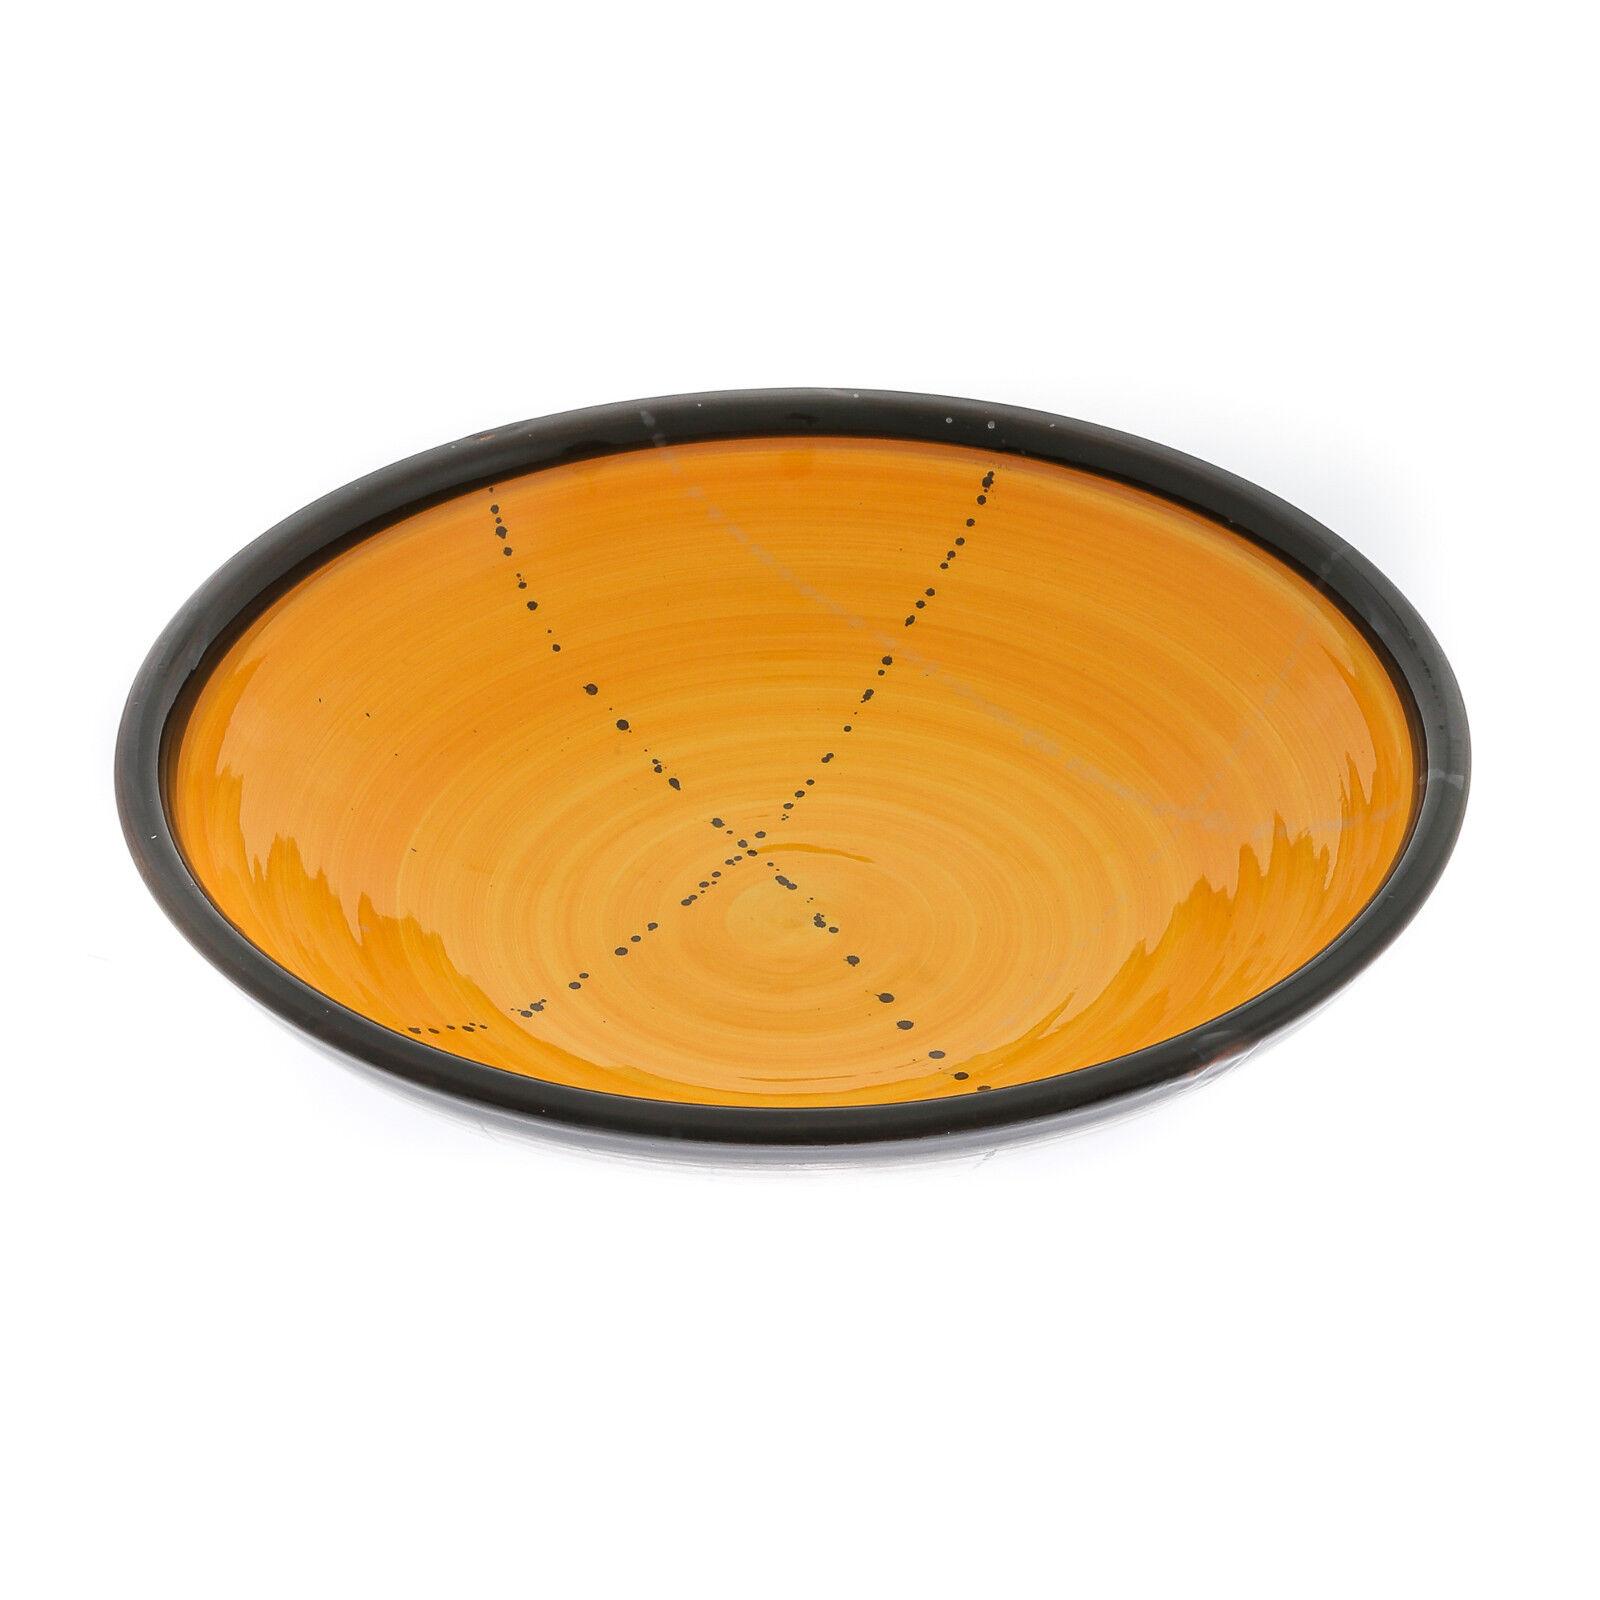 Dinner Bowl or Platter - Handmade Ceramic Centerpiece - Yellow 13 - 33cm